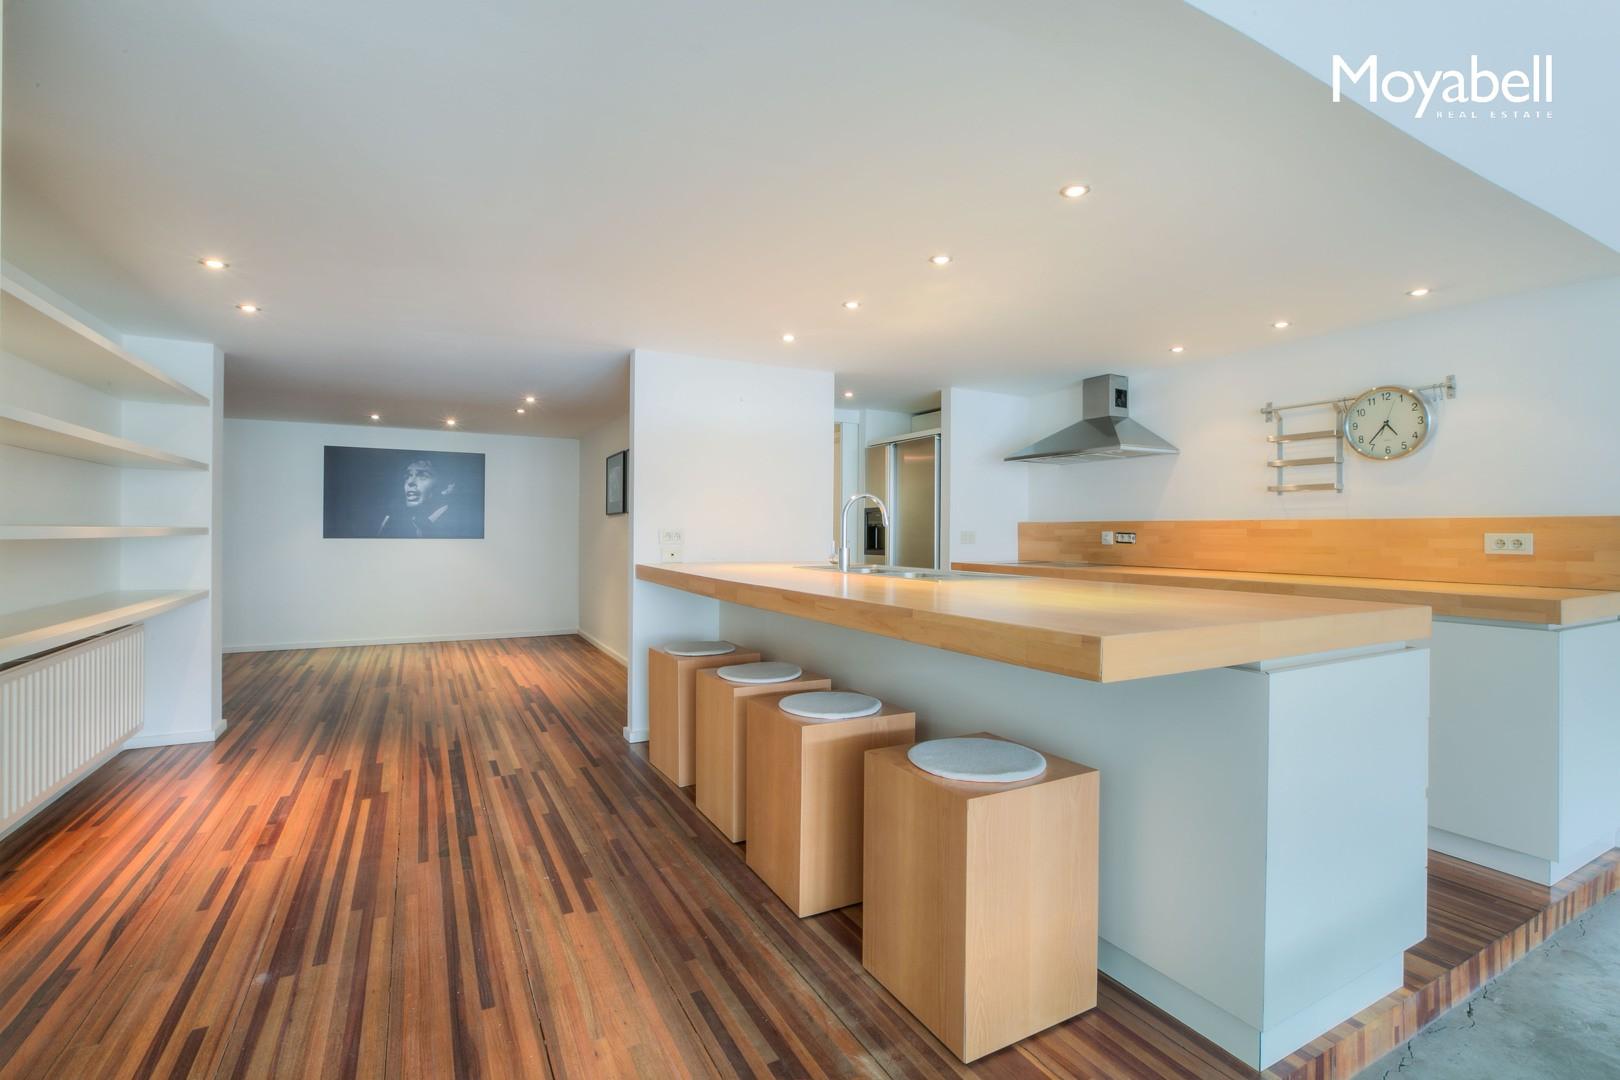 Riante loft van 235 m2 te Gent